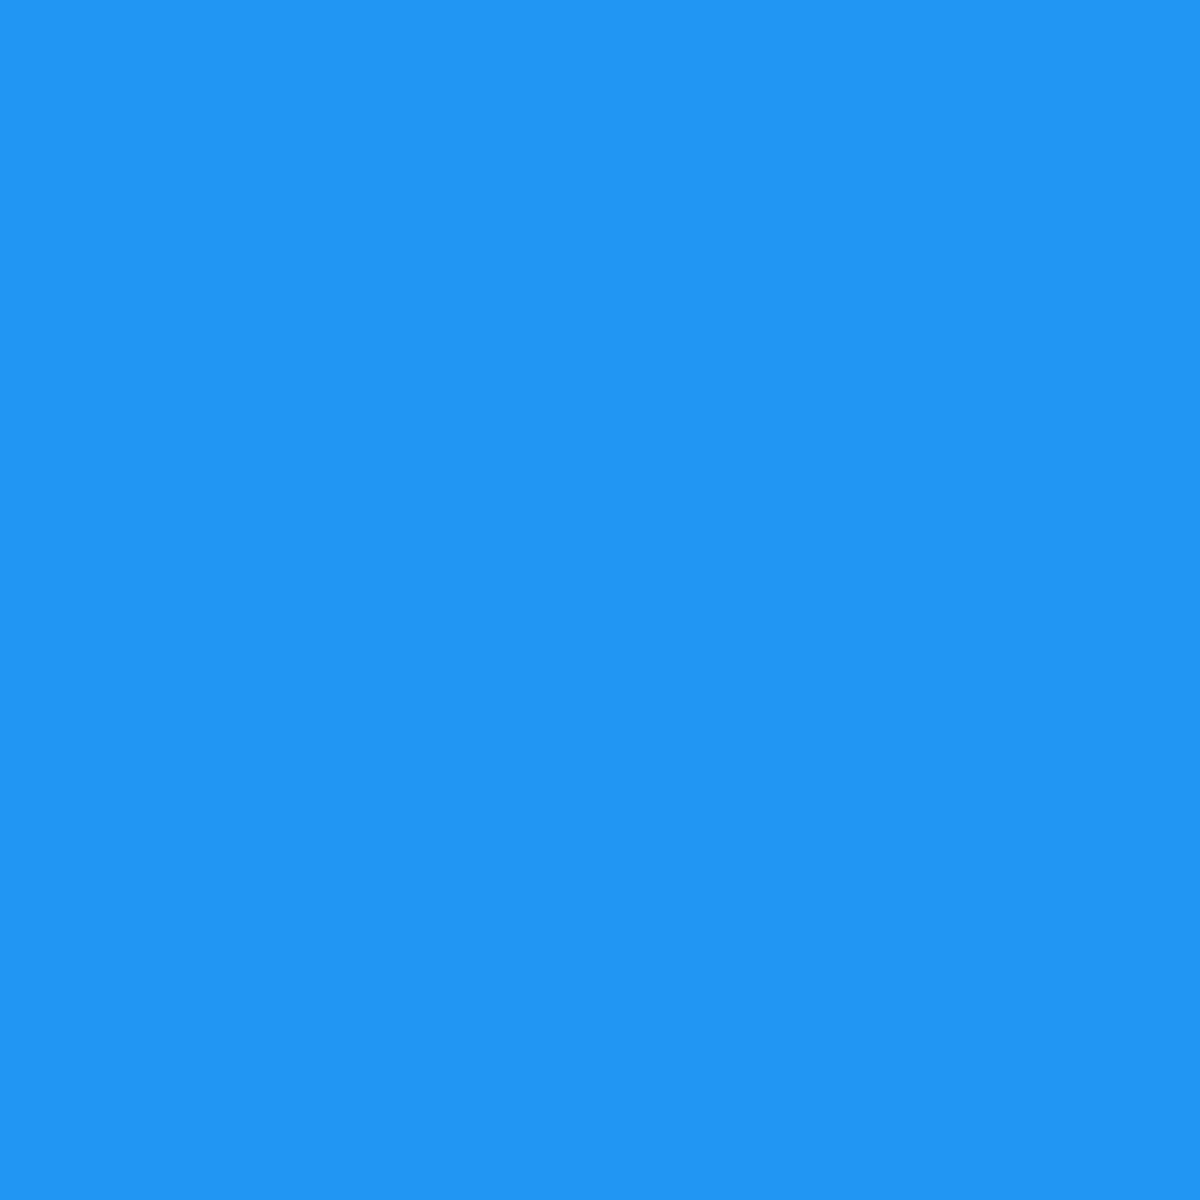 blue by Dtarawally